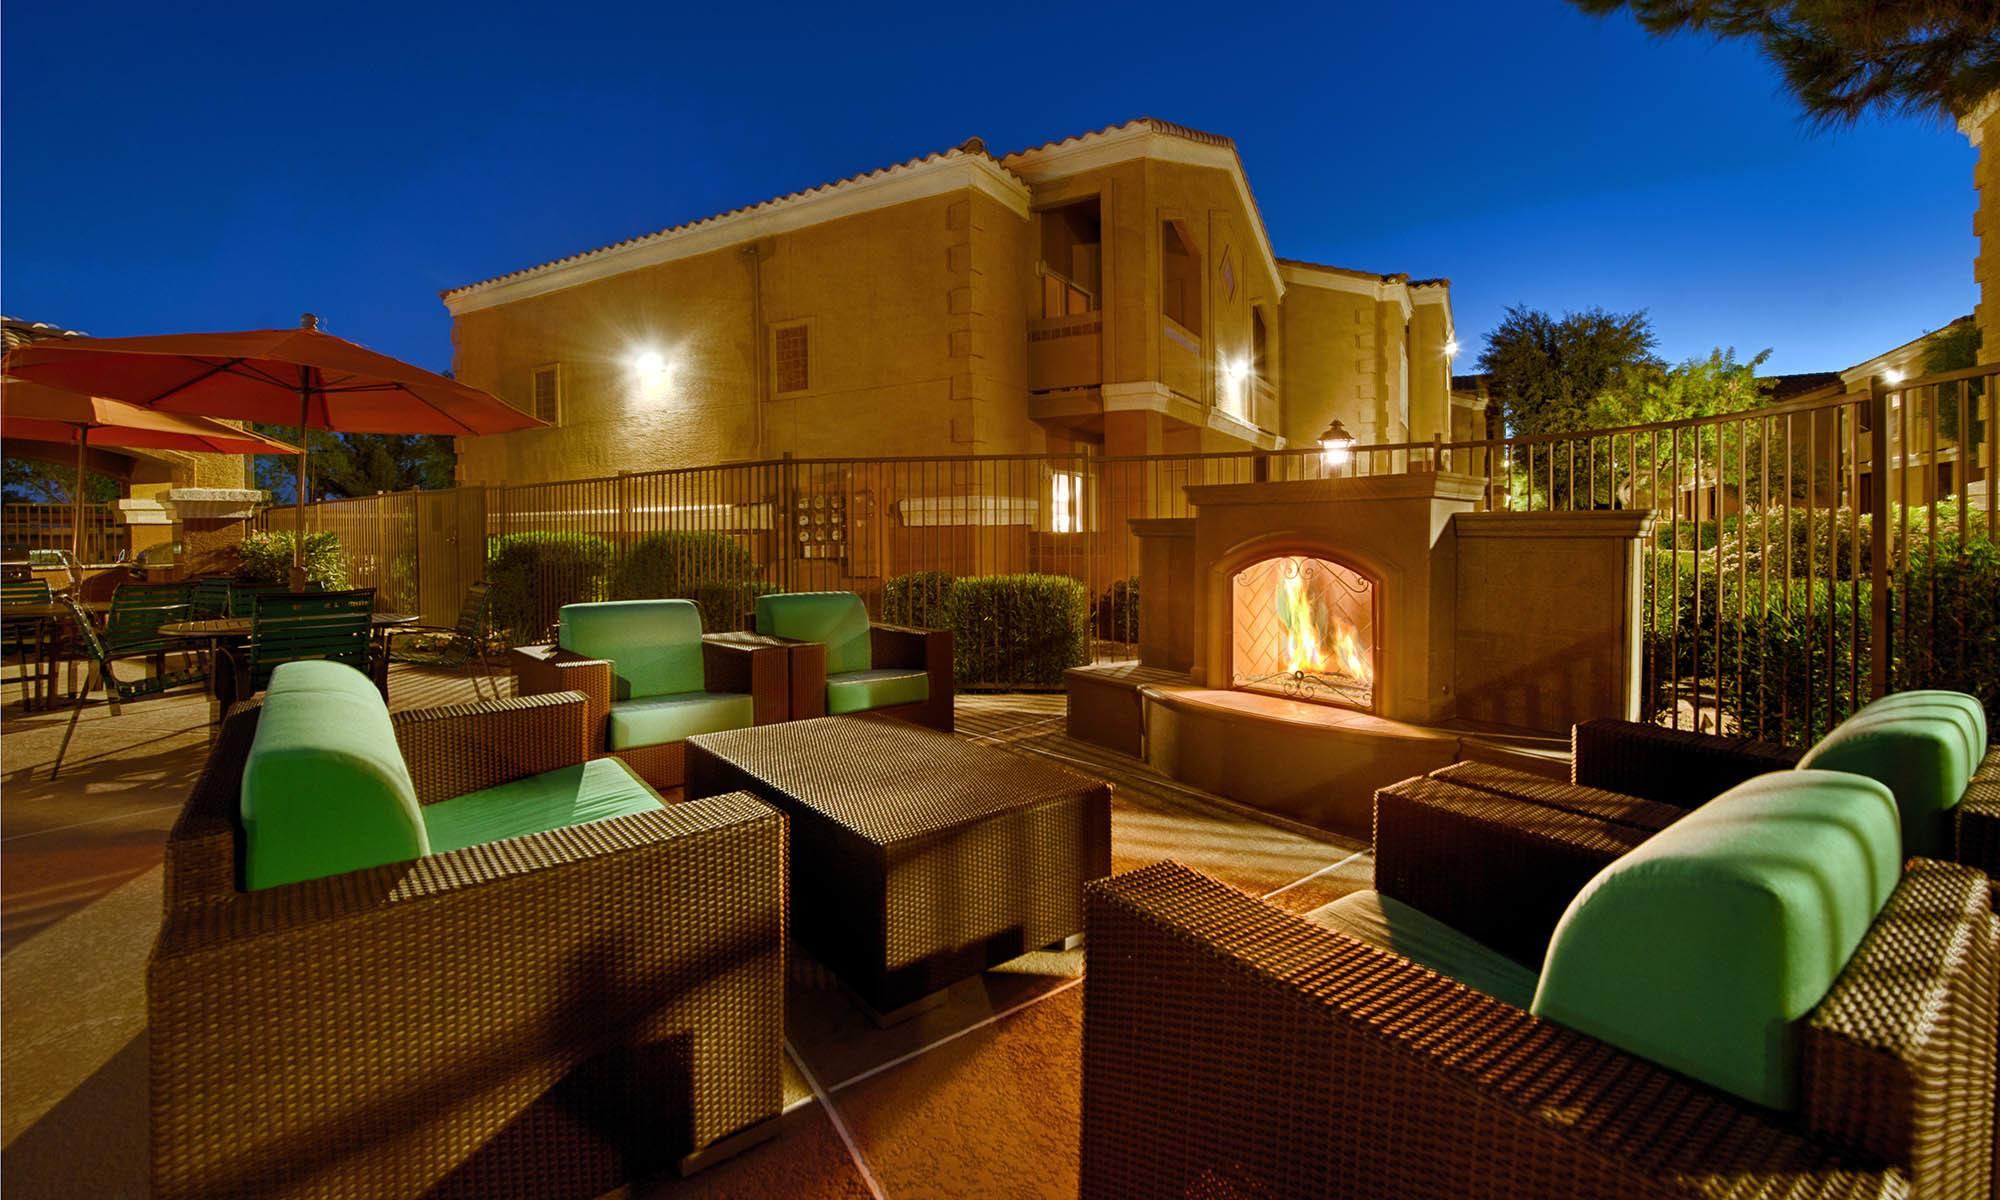 Apartments at 2150 Arizona Ave South in Chandler, Arizona